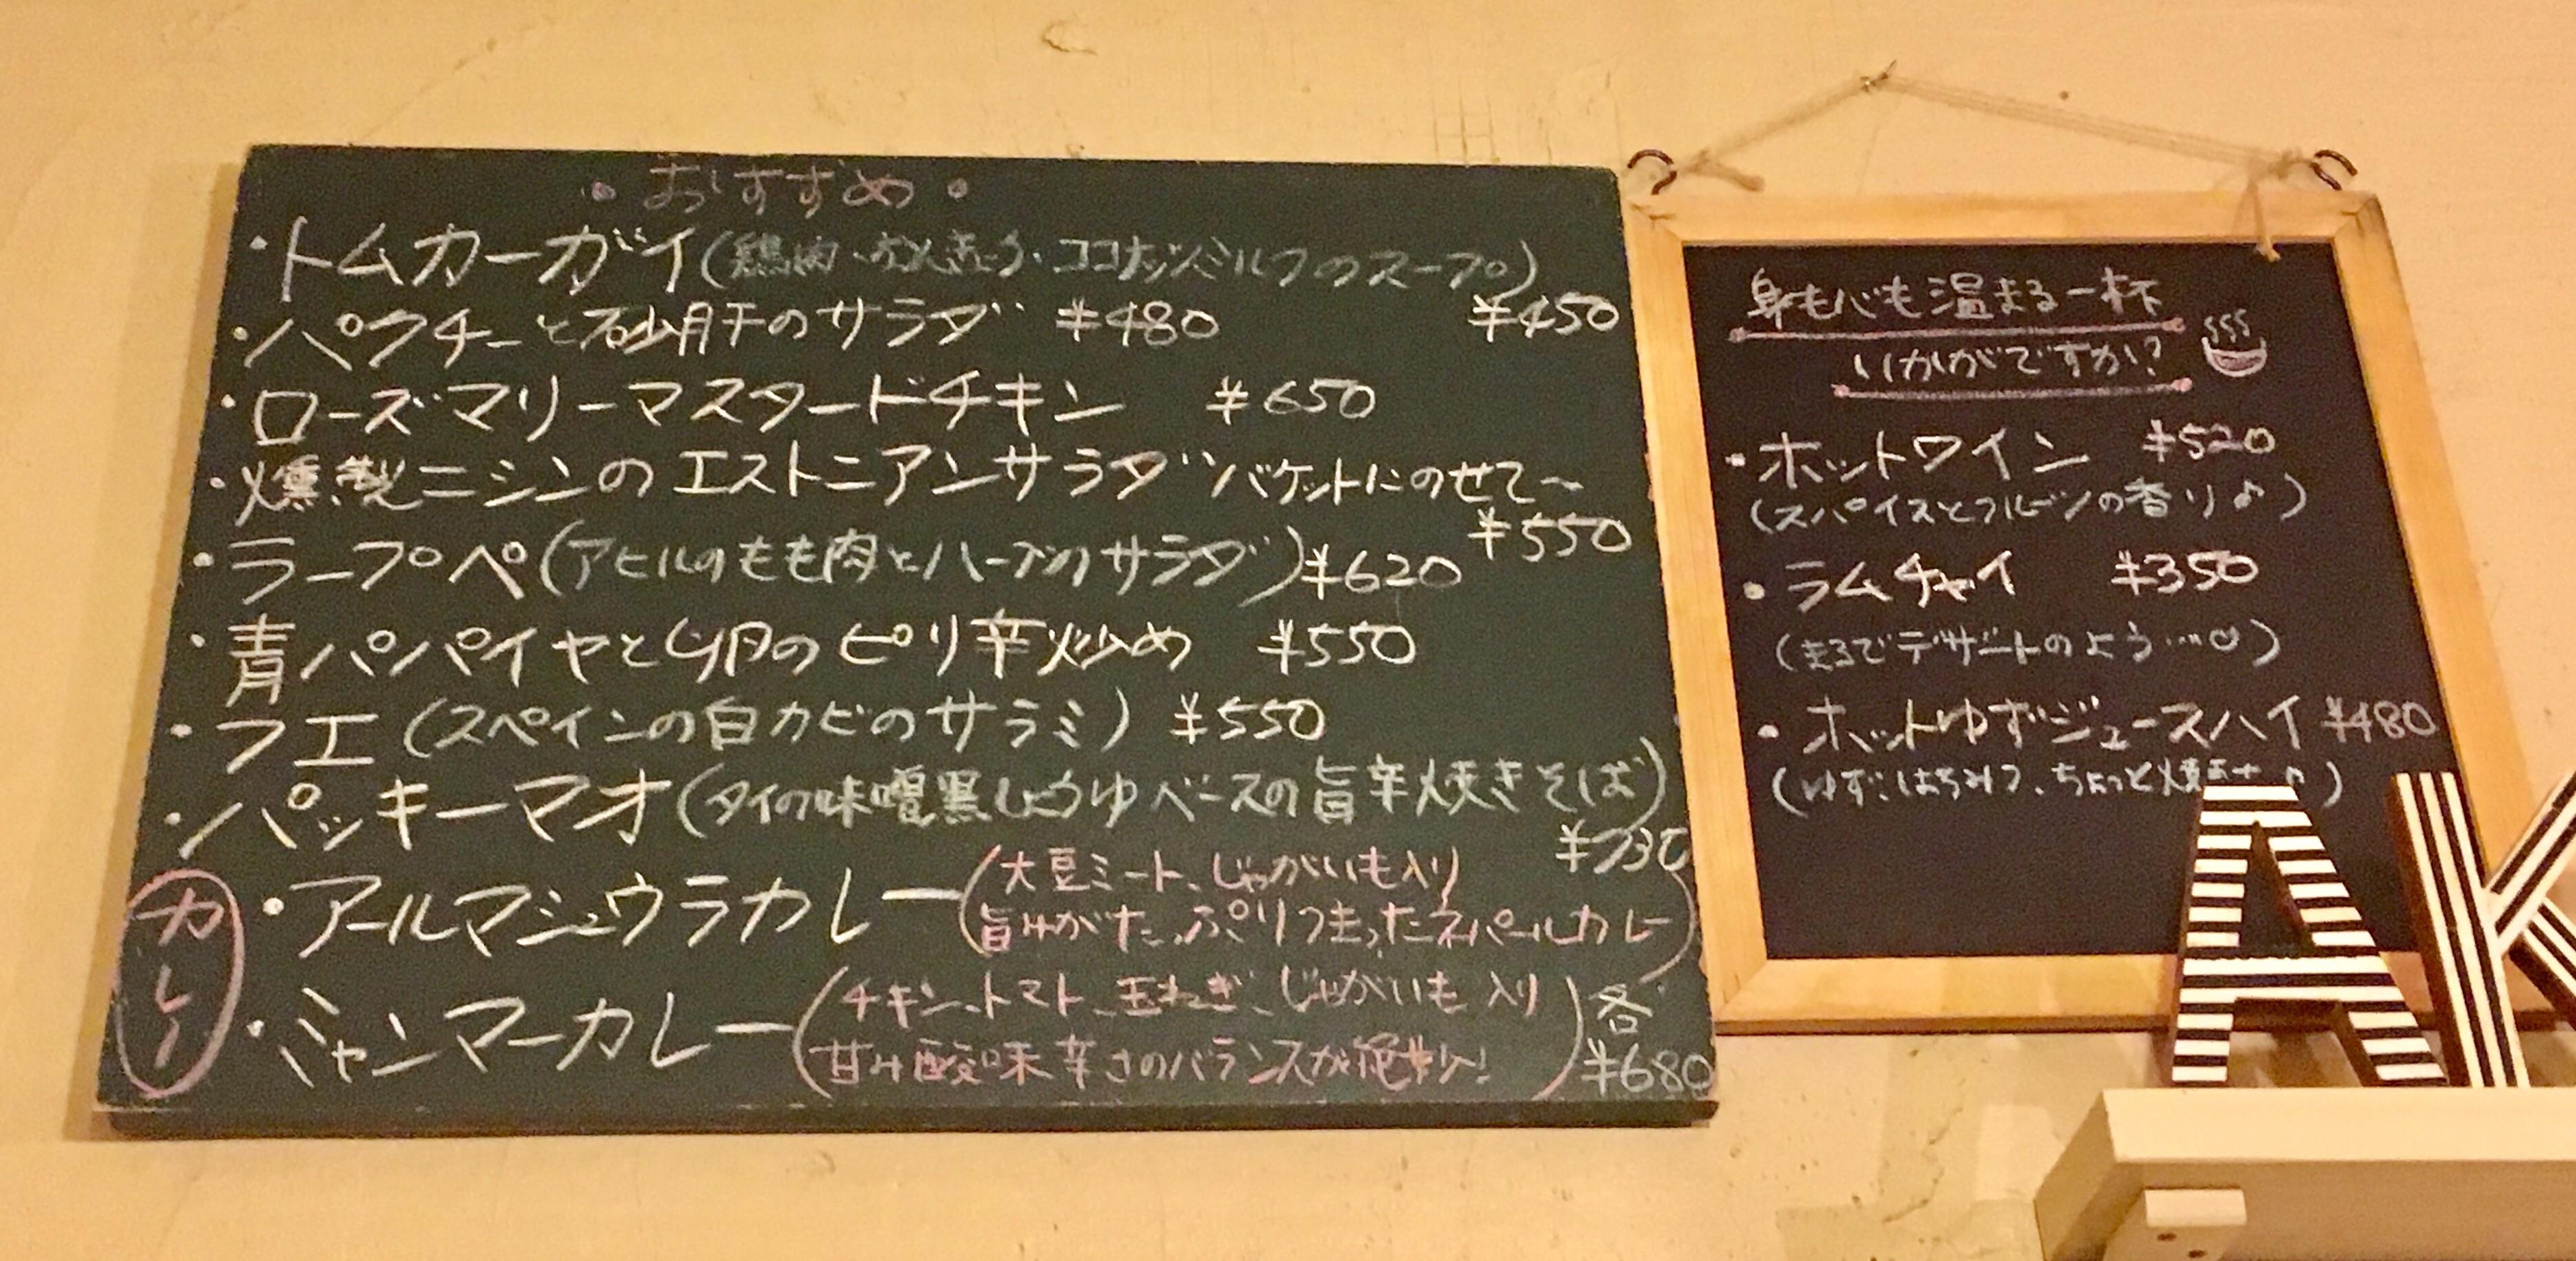 f:id:SoichiroIkeshita:20170428154007j:image